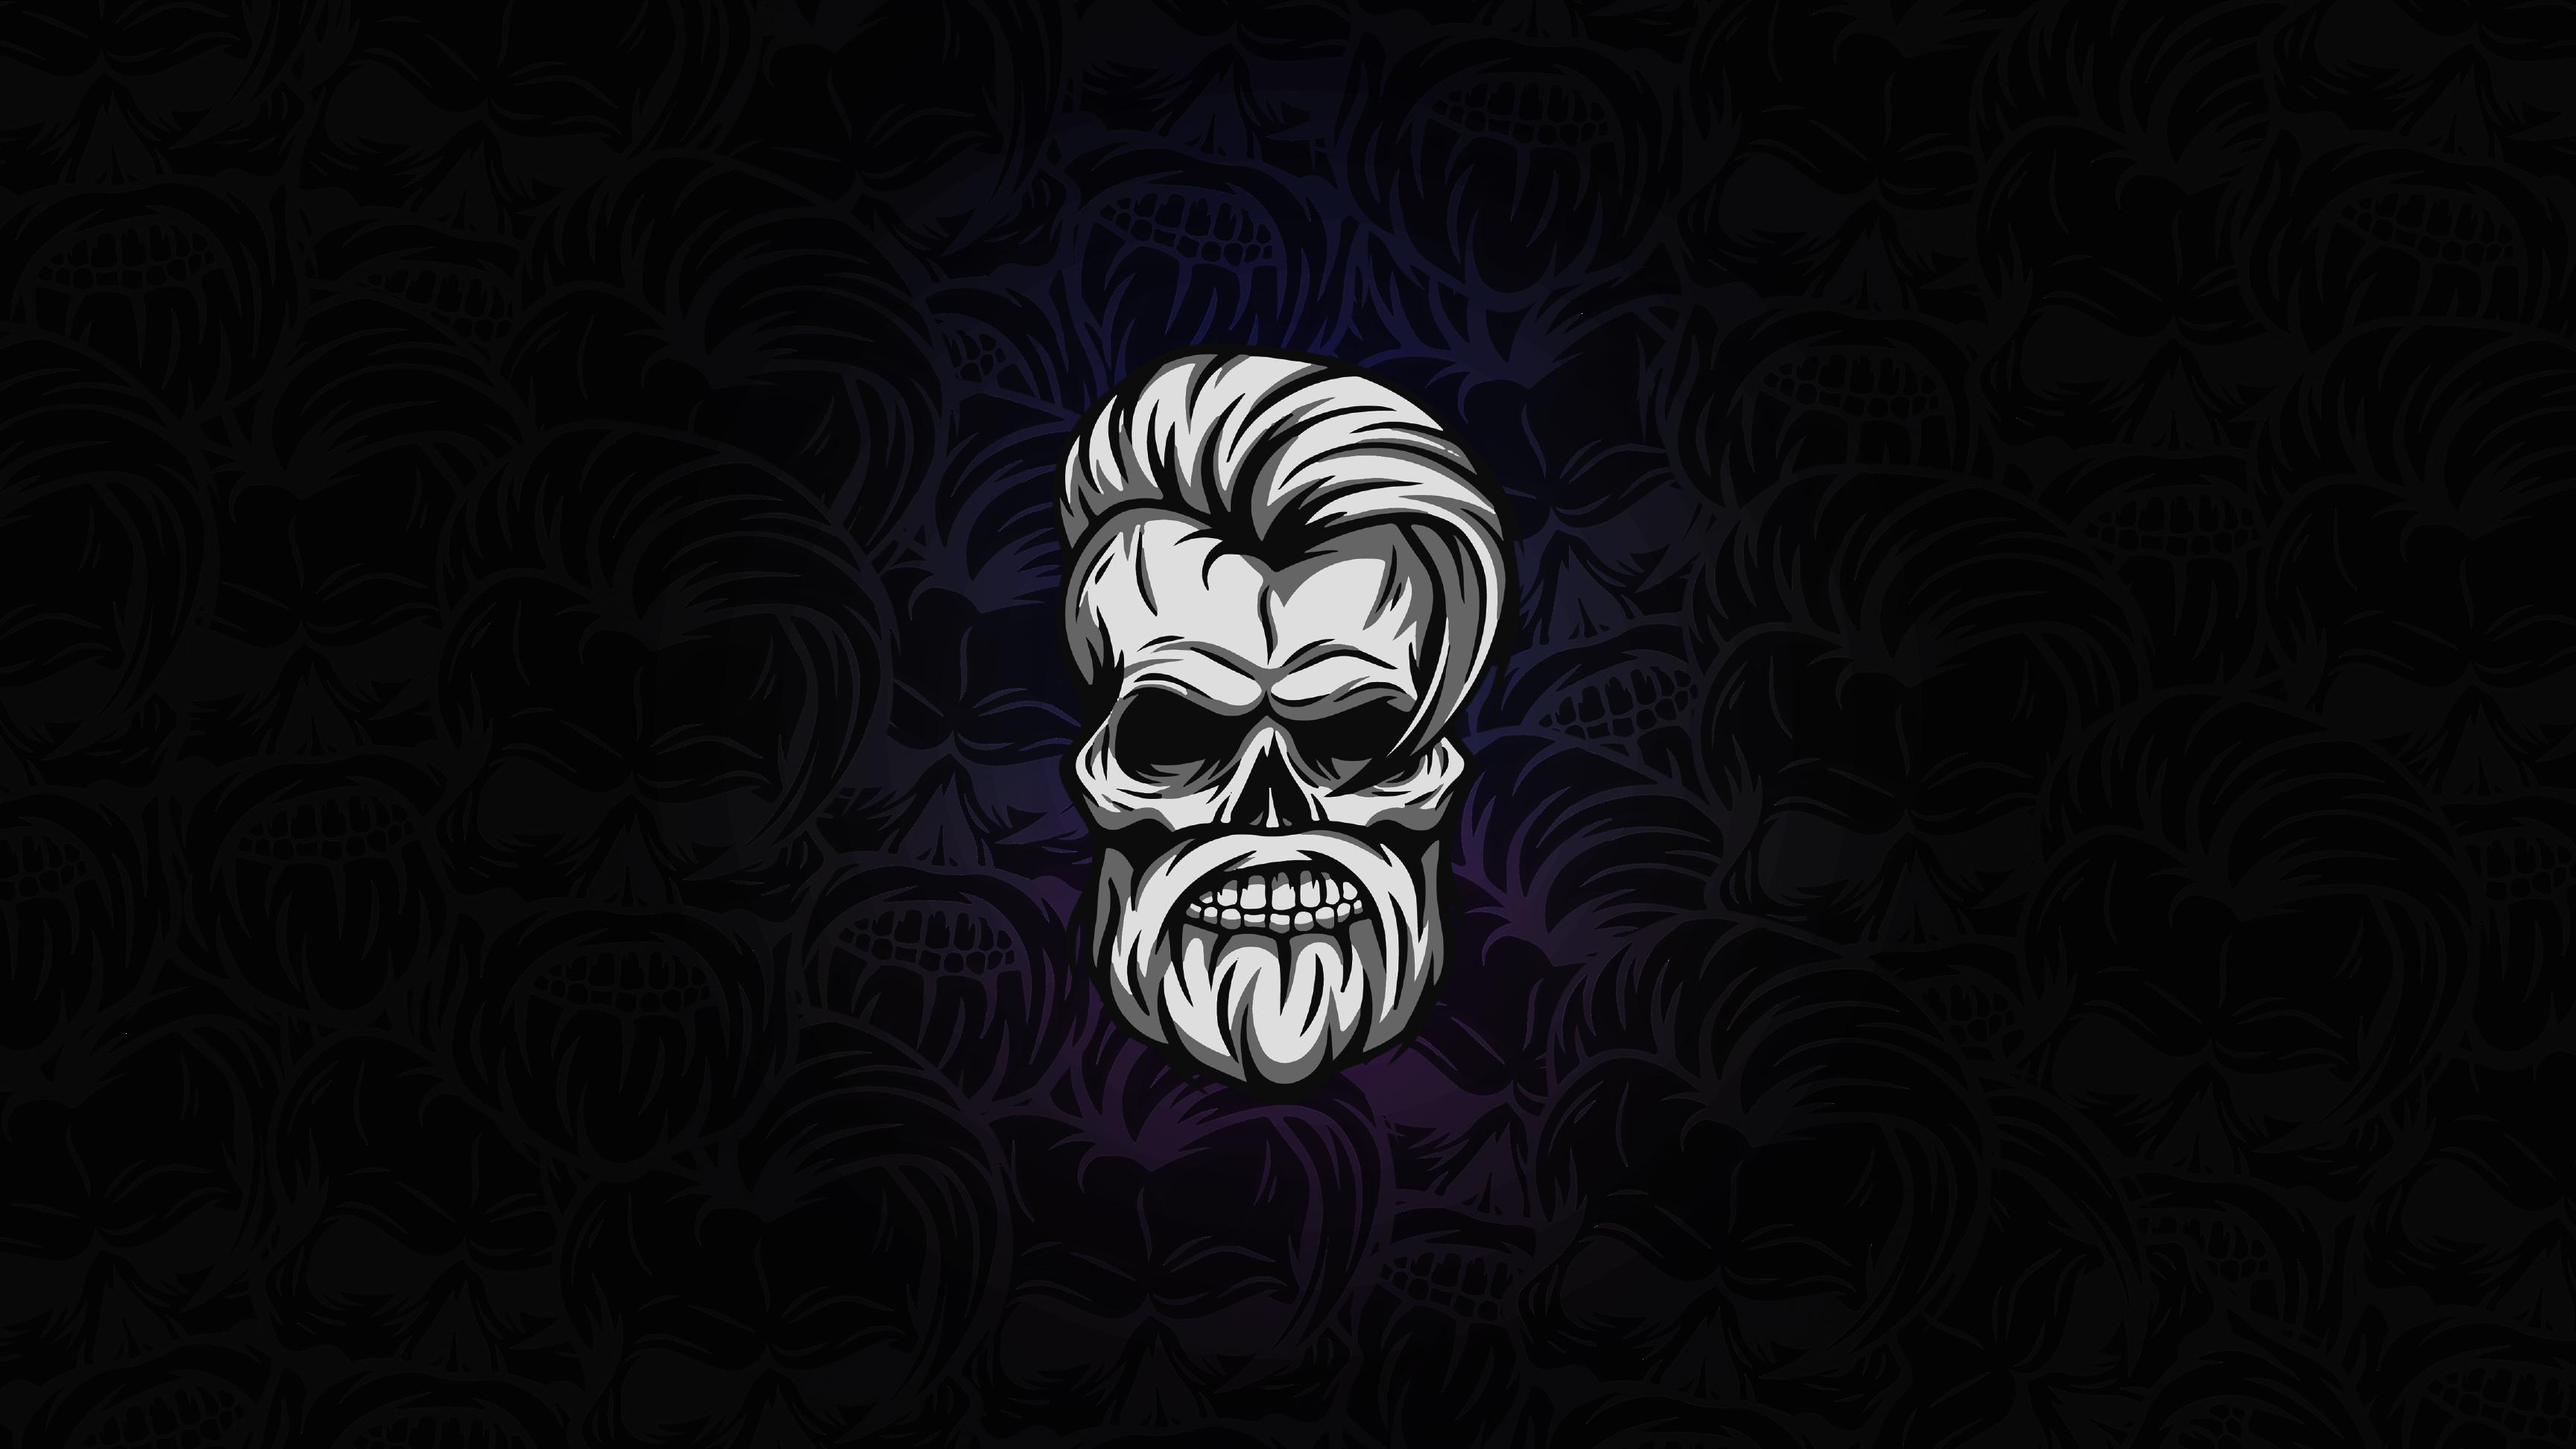 Beard Skull Dark 4k Hd Artist 4k Wallpapers Images